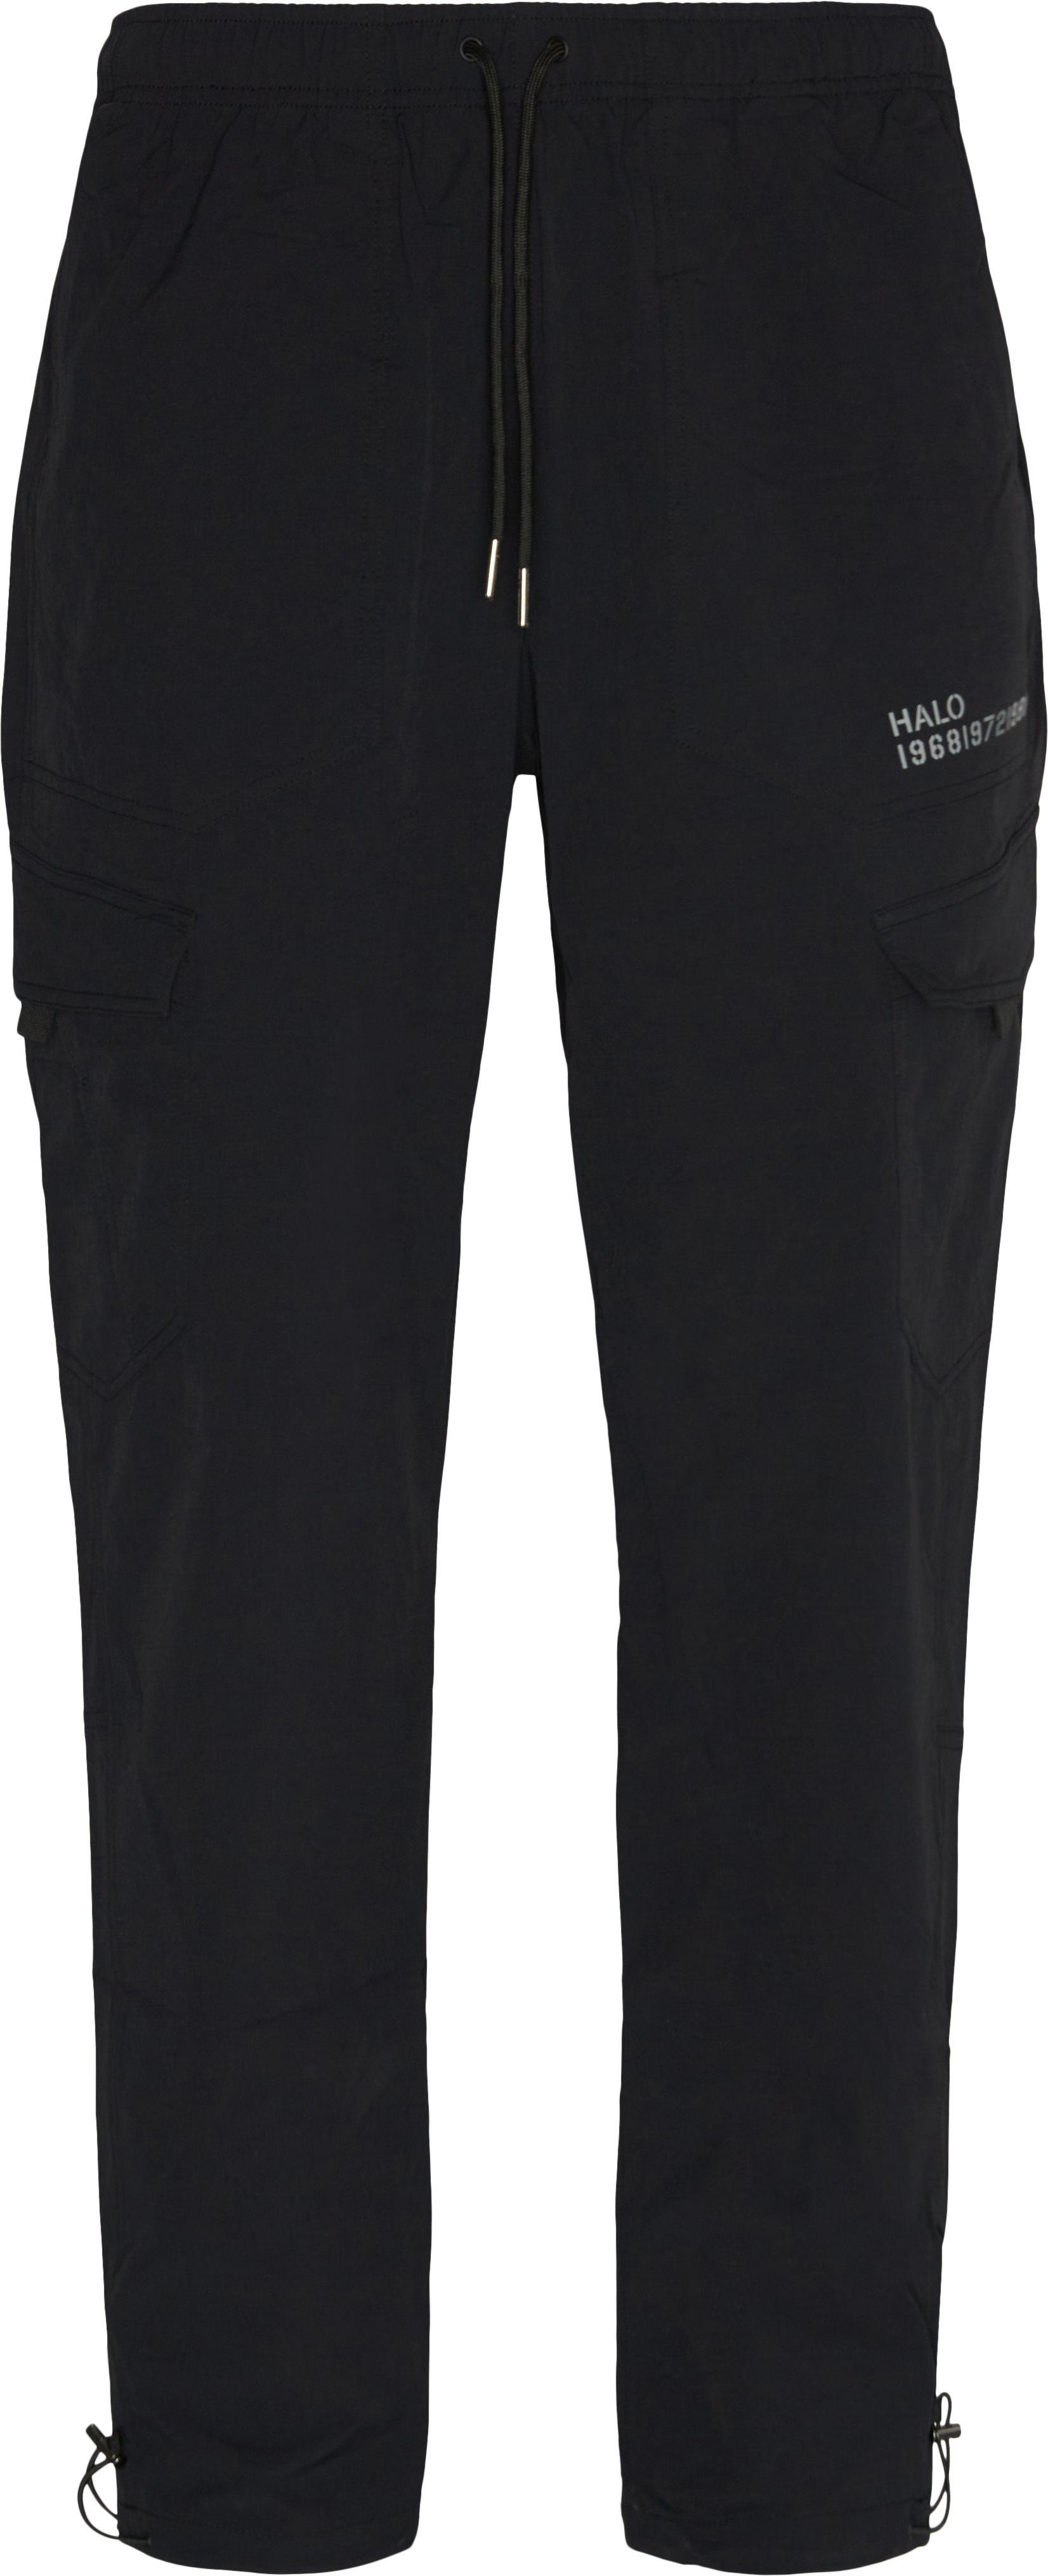 Trail Pant - Trousers - Regular fit - Black